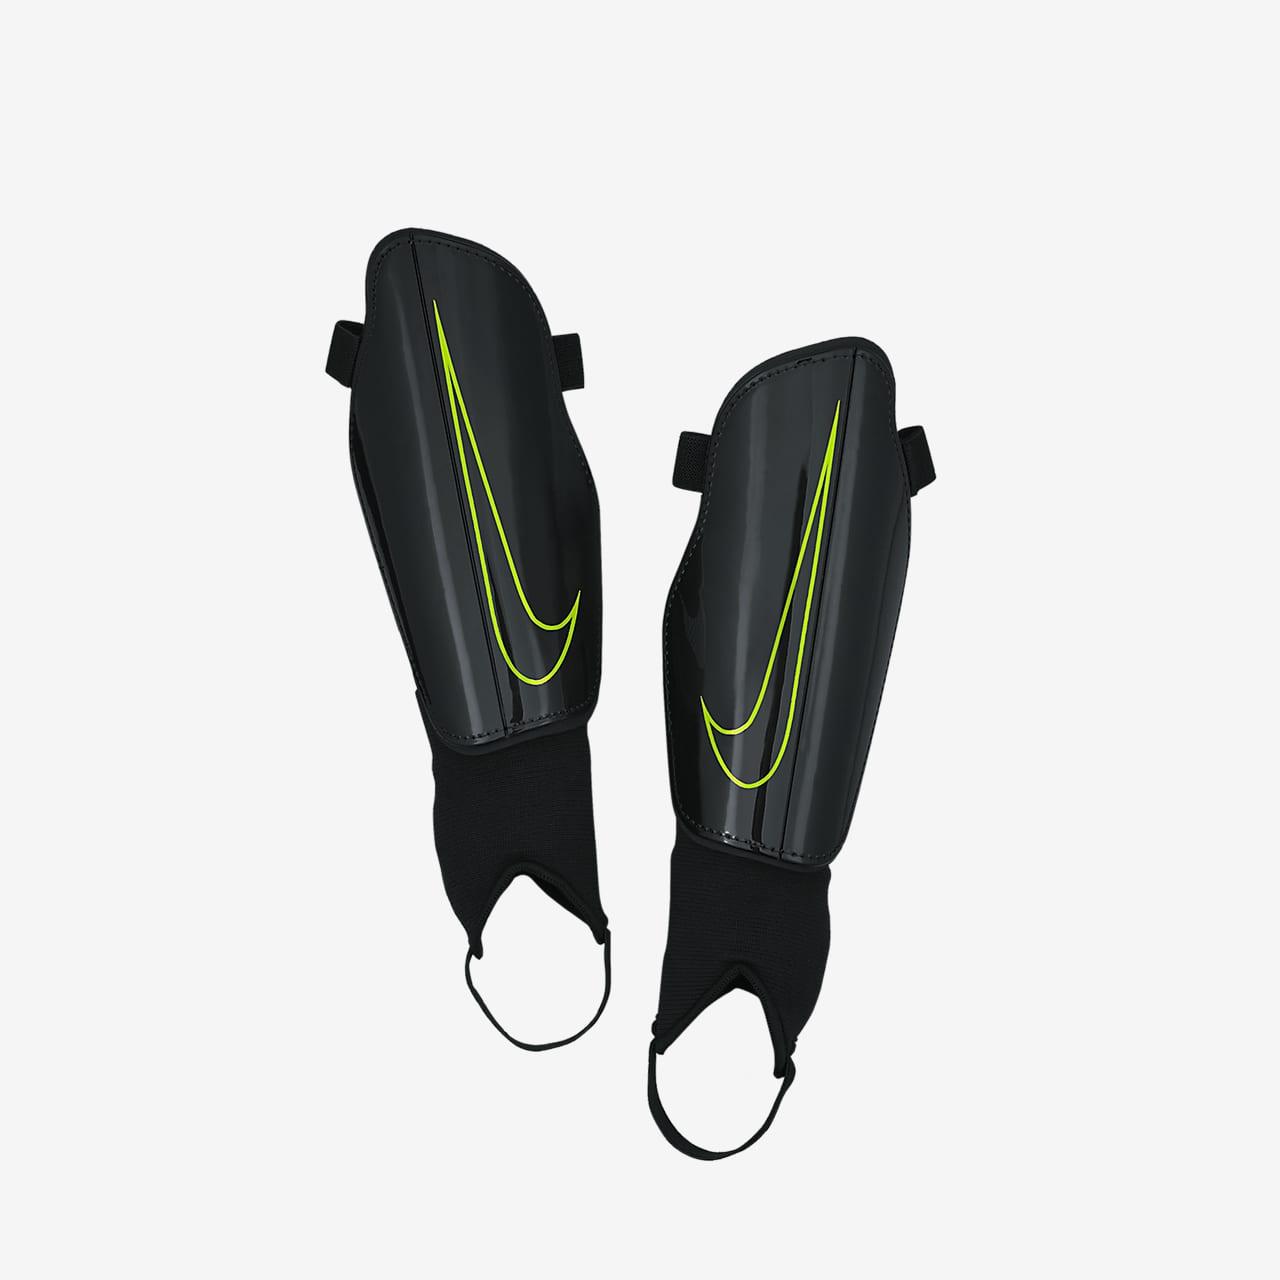 Nike Charge 2.0 Football Shinguards